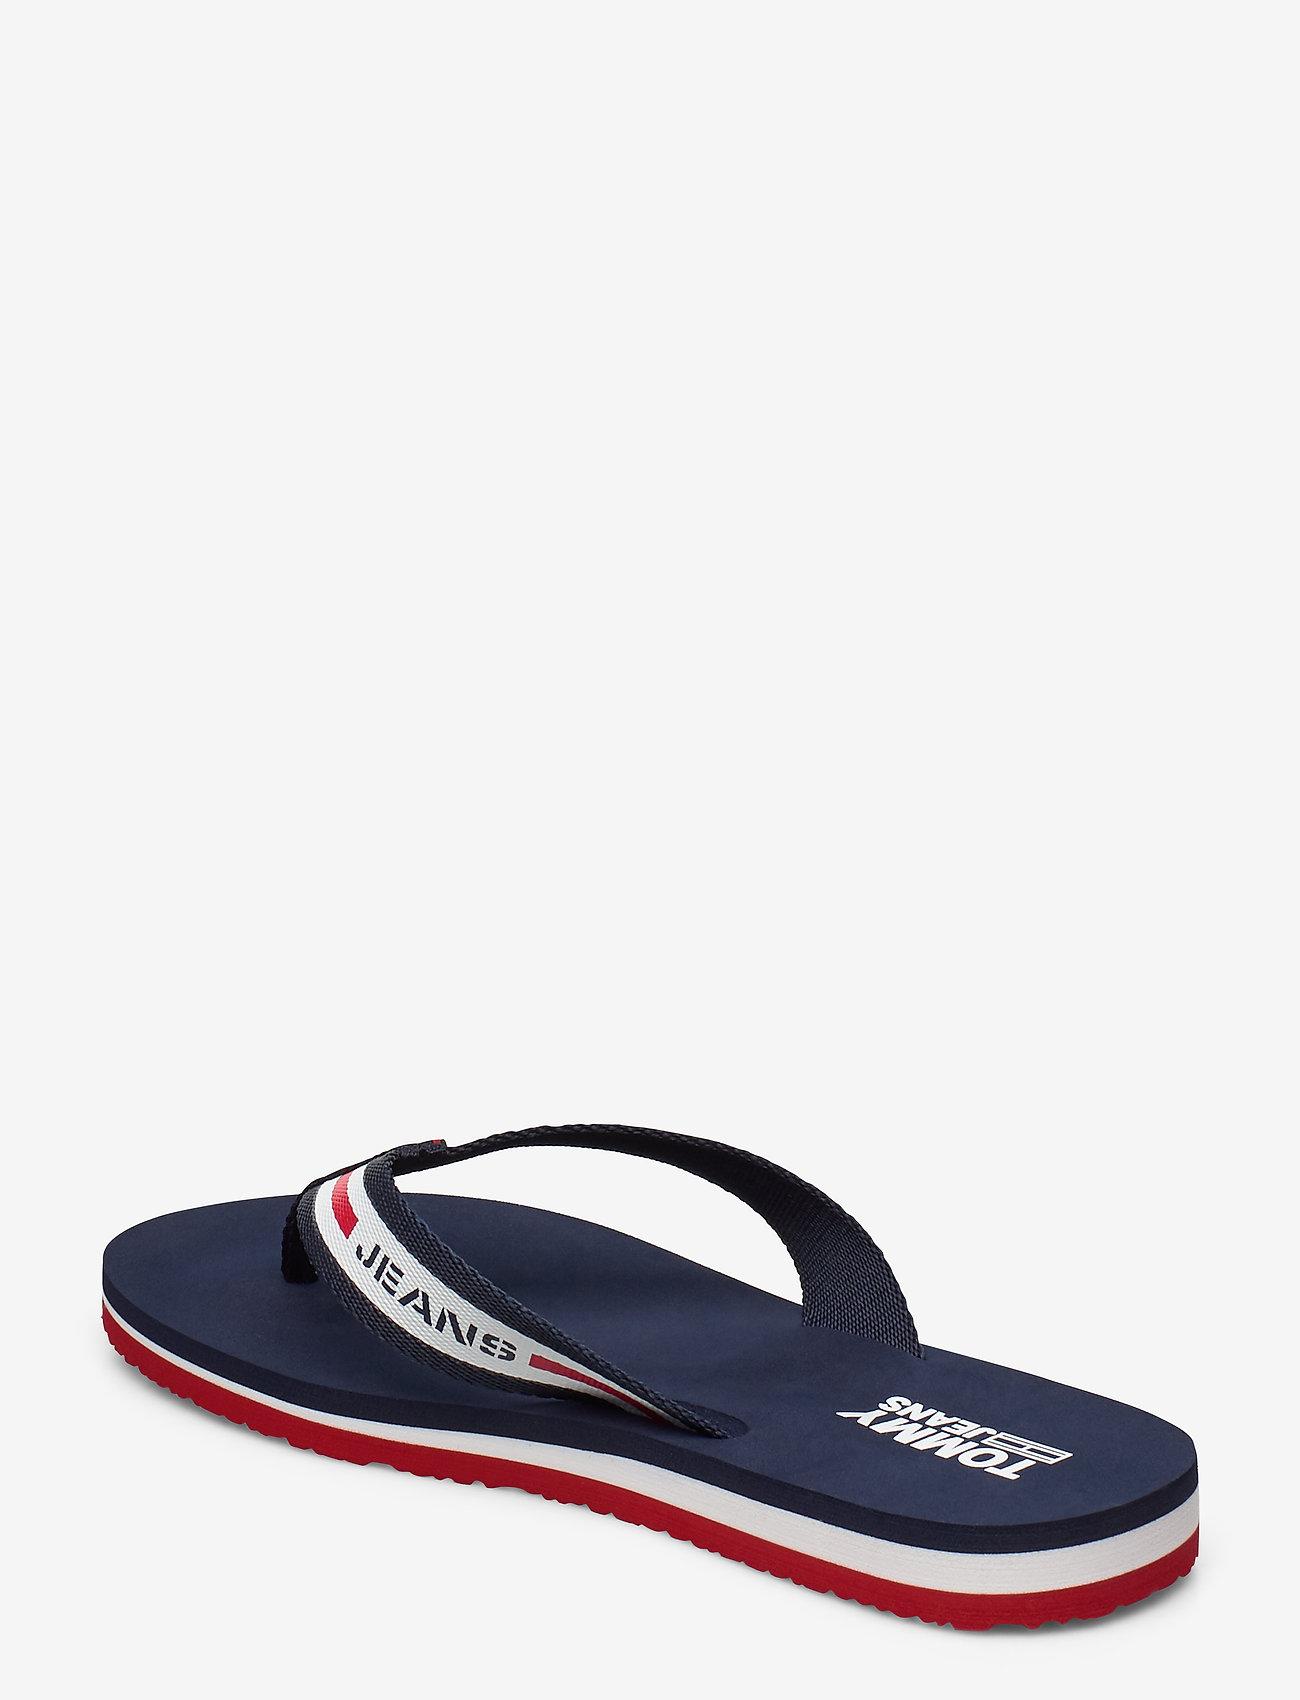 Chunky Tape Flat Beach Sandal (Twillight Navy) - Tommy Hilfiger